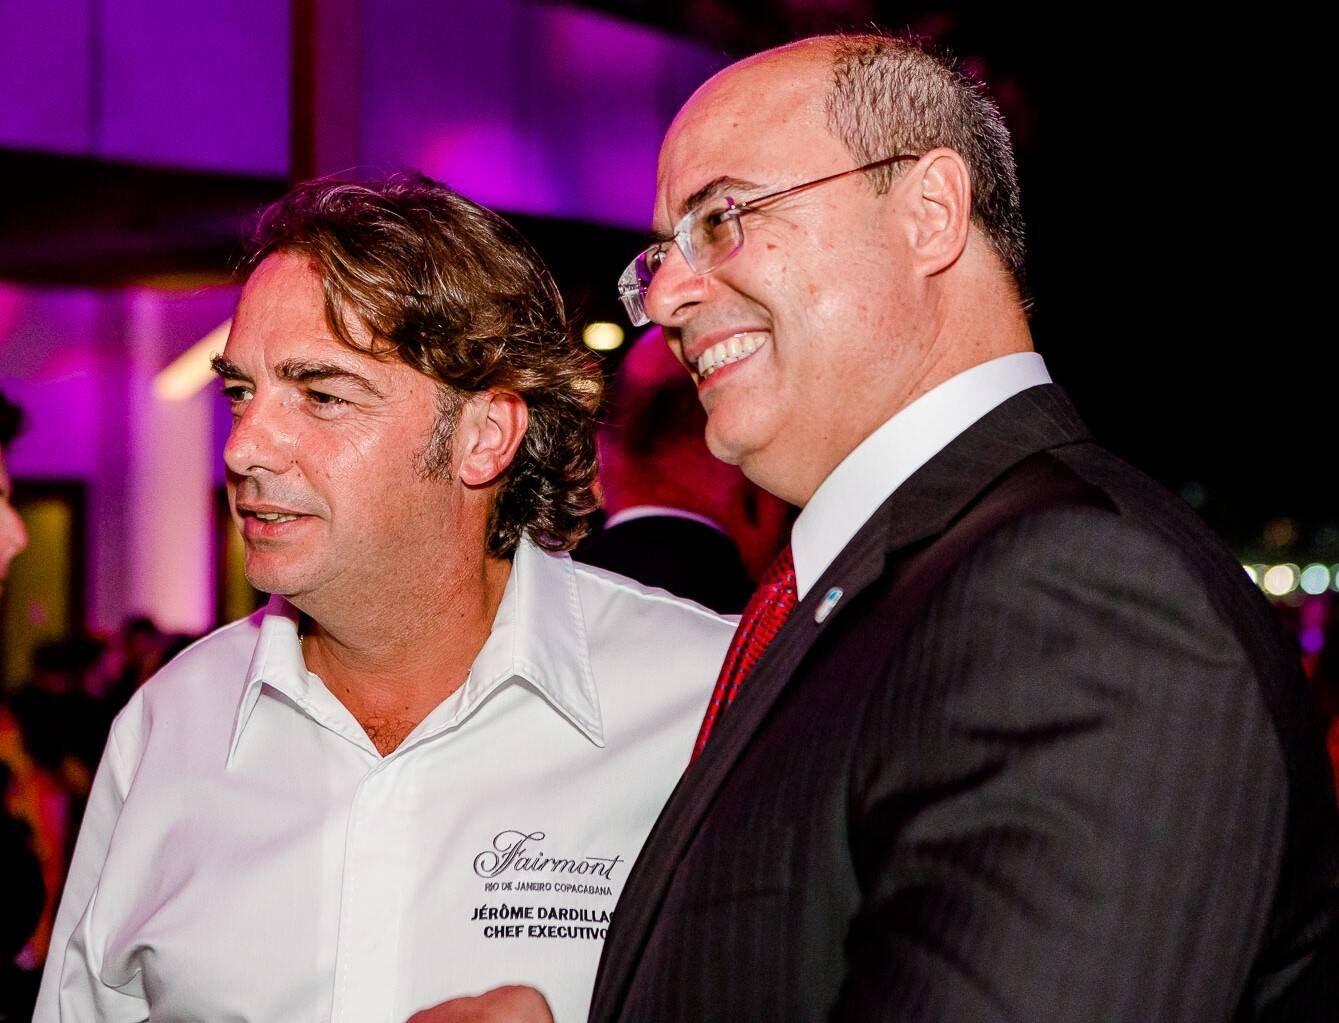 Jérôme Dardillac, o chef do hotel, com Wilson Witzel /Foto: Bruno Ryfer